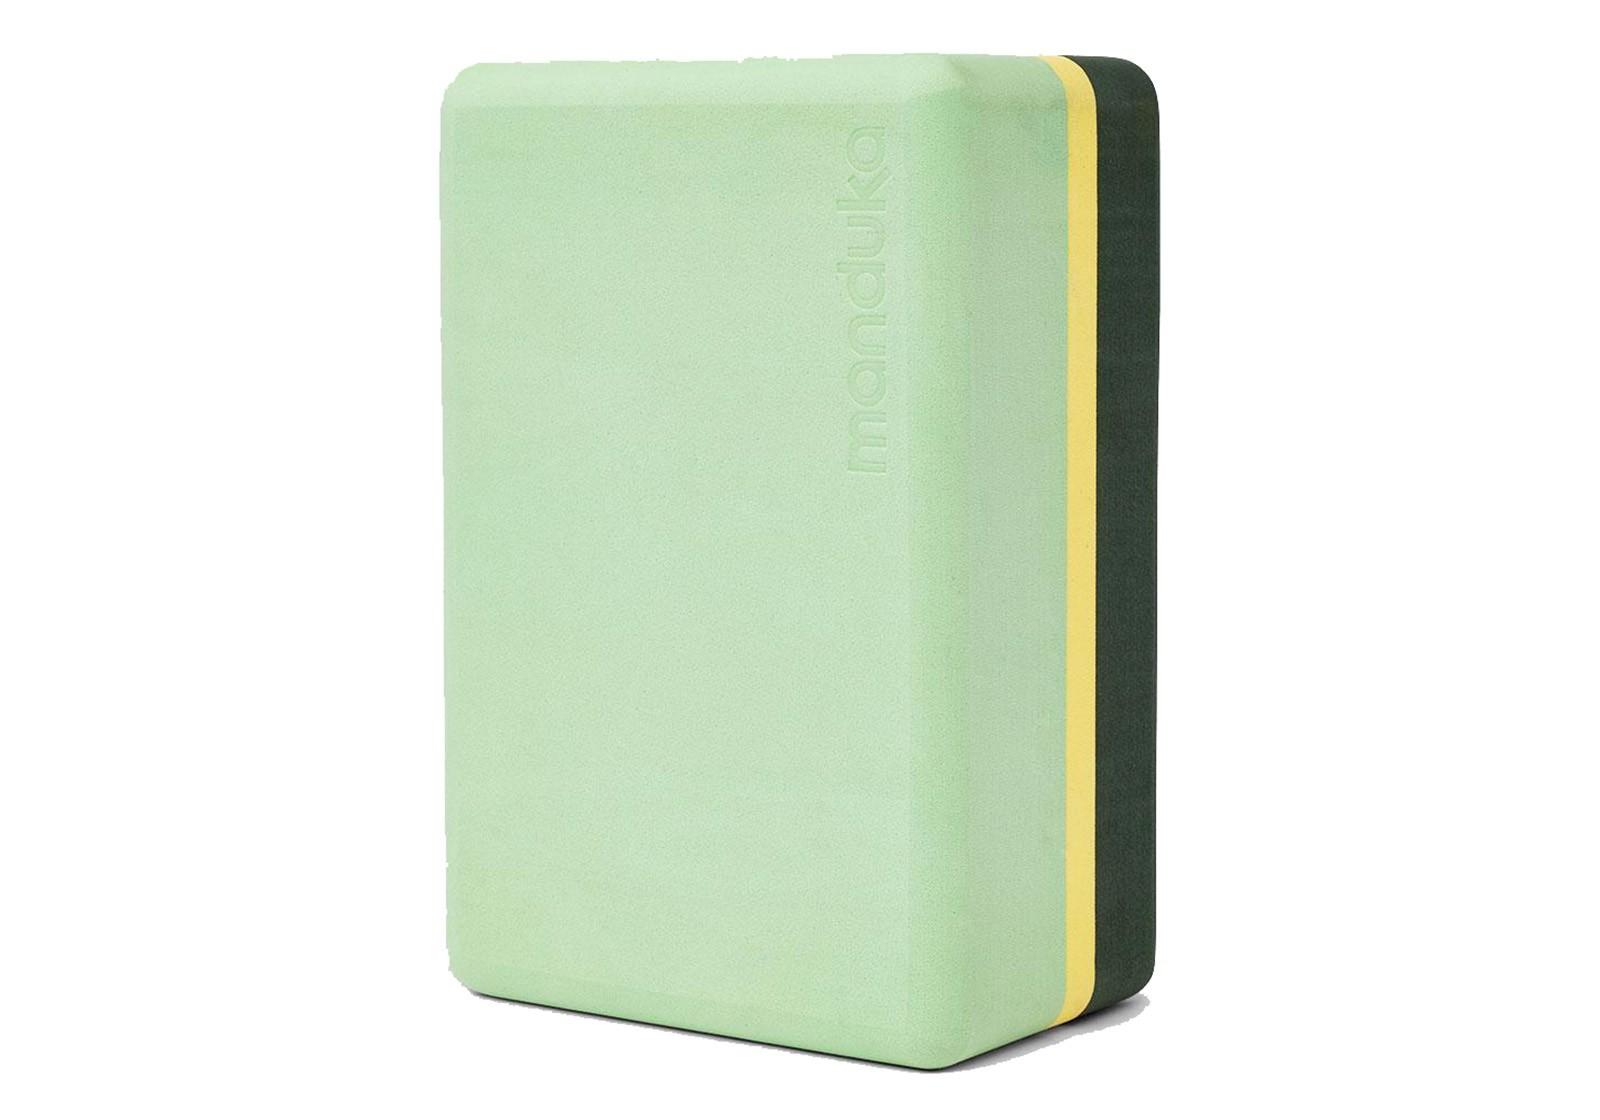 blok-dlya-jogi-manduka-recycled-foam-yoga-block-green-ash